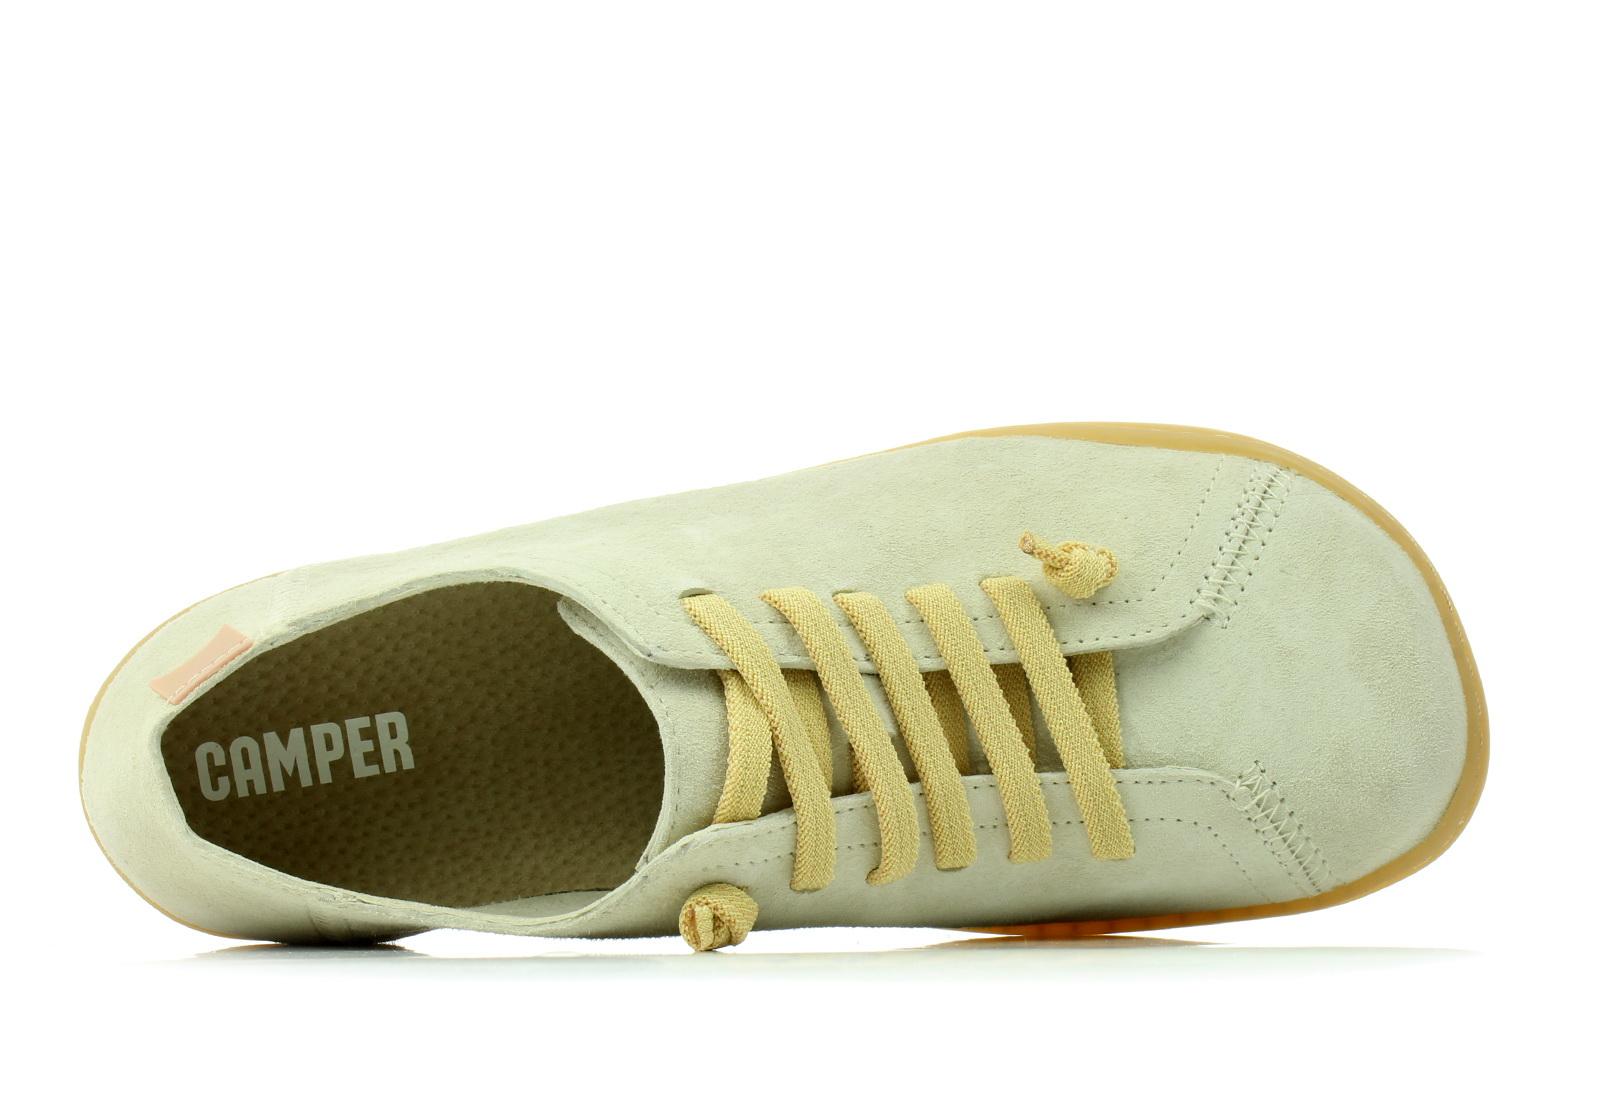 d355495f1b Camper Cipő - Peu Cami - K200586-008 - Office Shoes Magyarország